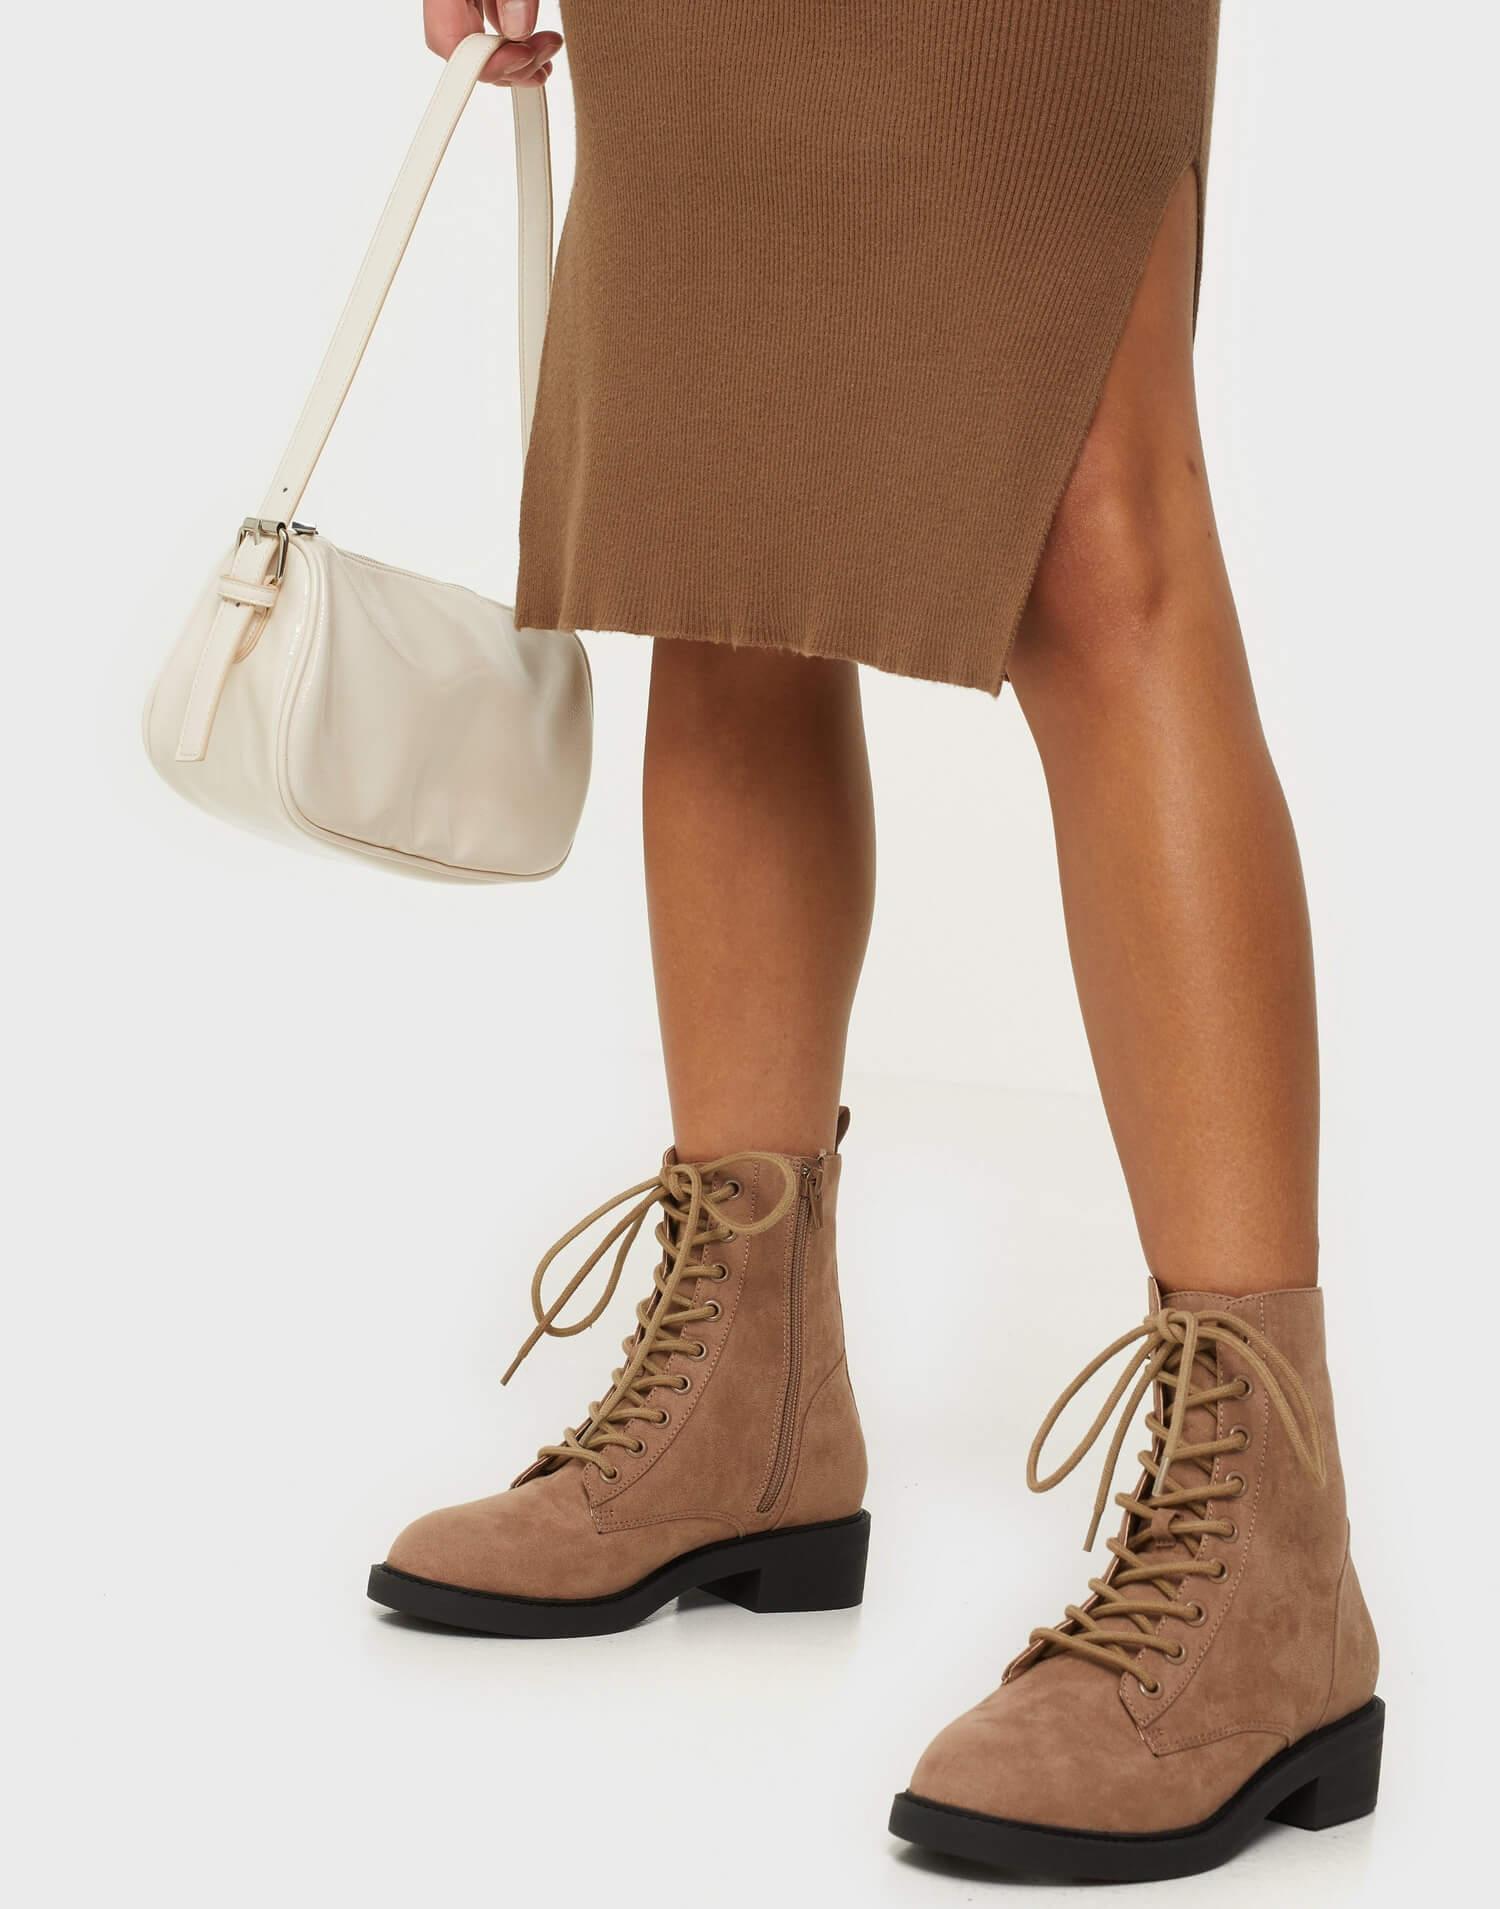 Nougatfärgade boots i mockaimitation från NLY Shoes.